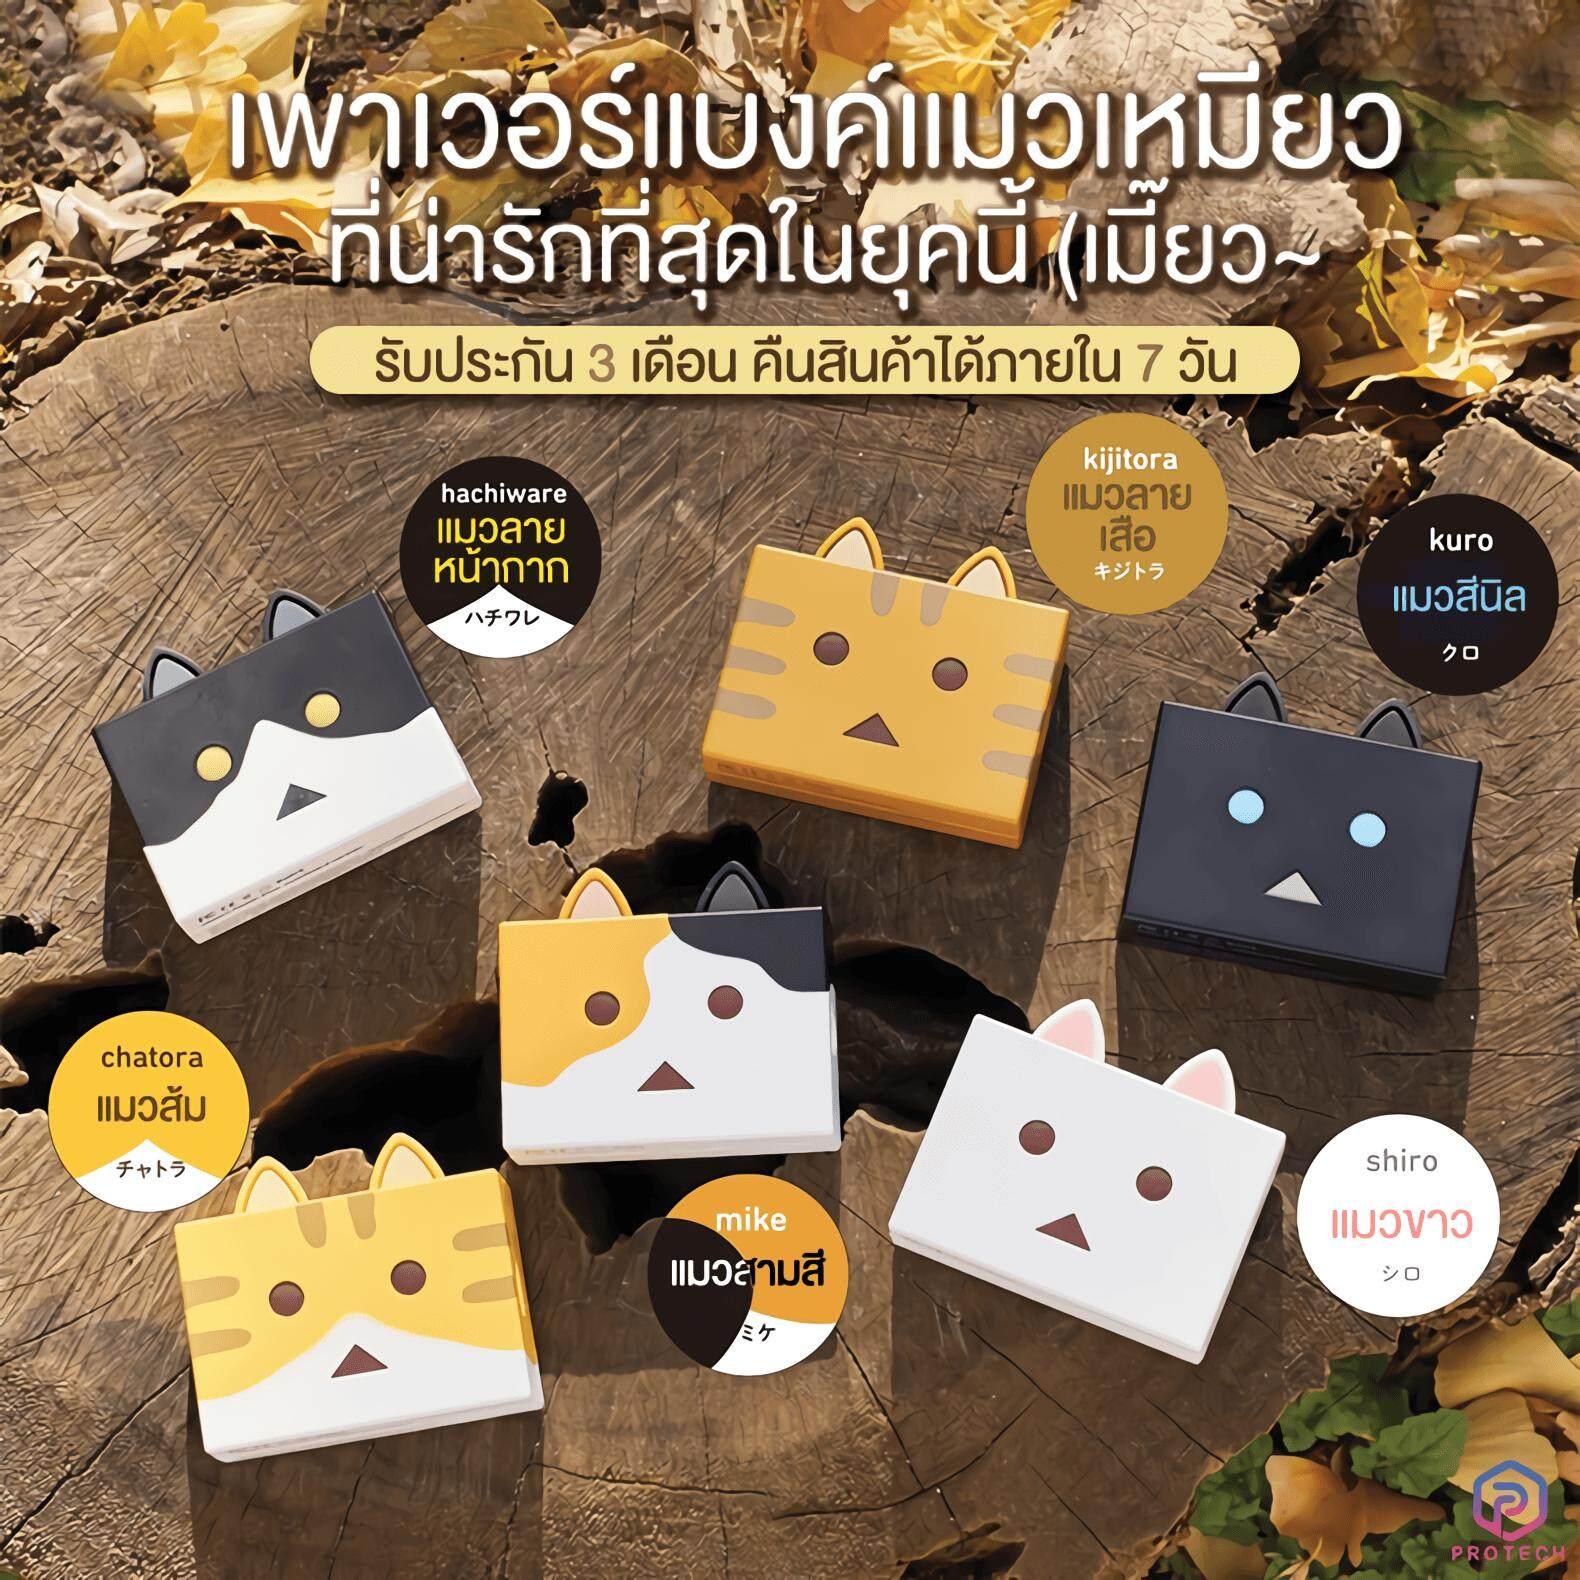 Protech Cheero Nyanboard Power Plus 6000mah / Danboard Cute Cat Power Bank เพาเวอร์แบงค์แมวน่ารัก แบตเตอรี่สำรอง ที่ชาร์จแบตสำรอง พกพาง่าย / Iphone Samsung Huawei Xiaomi Sony Sharp Lg.